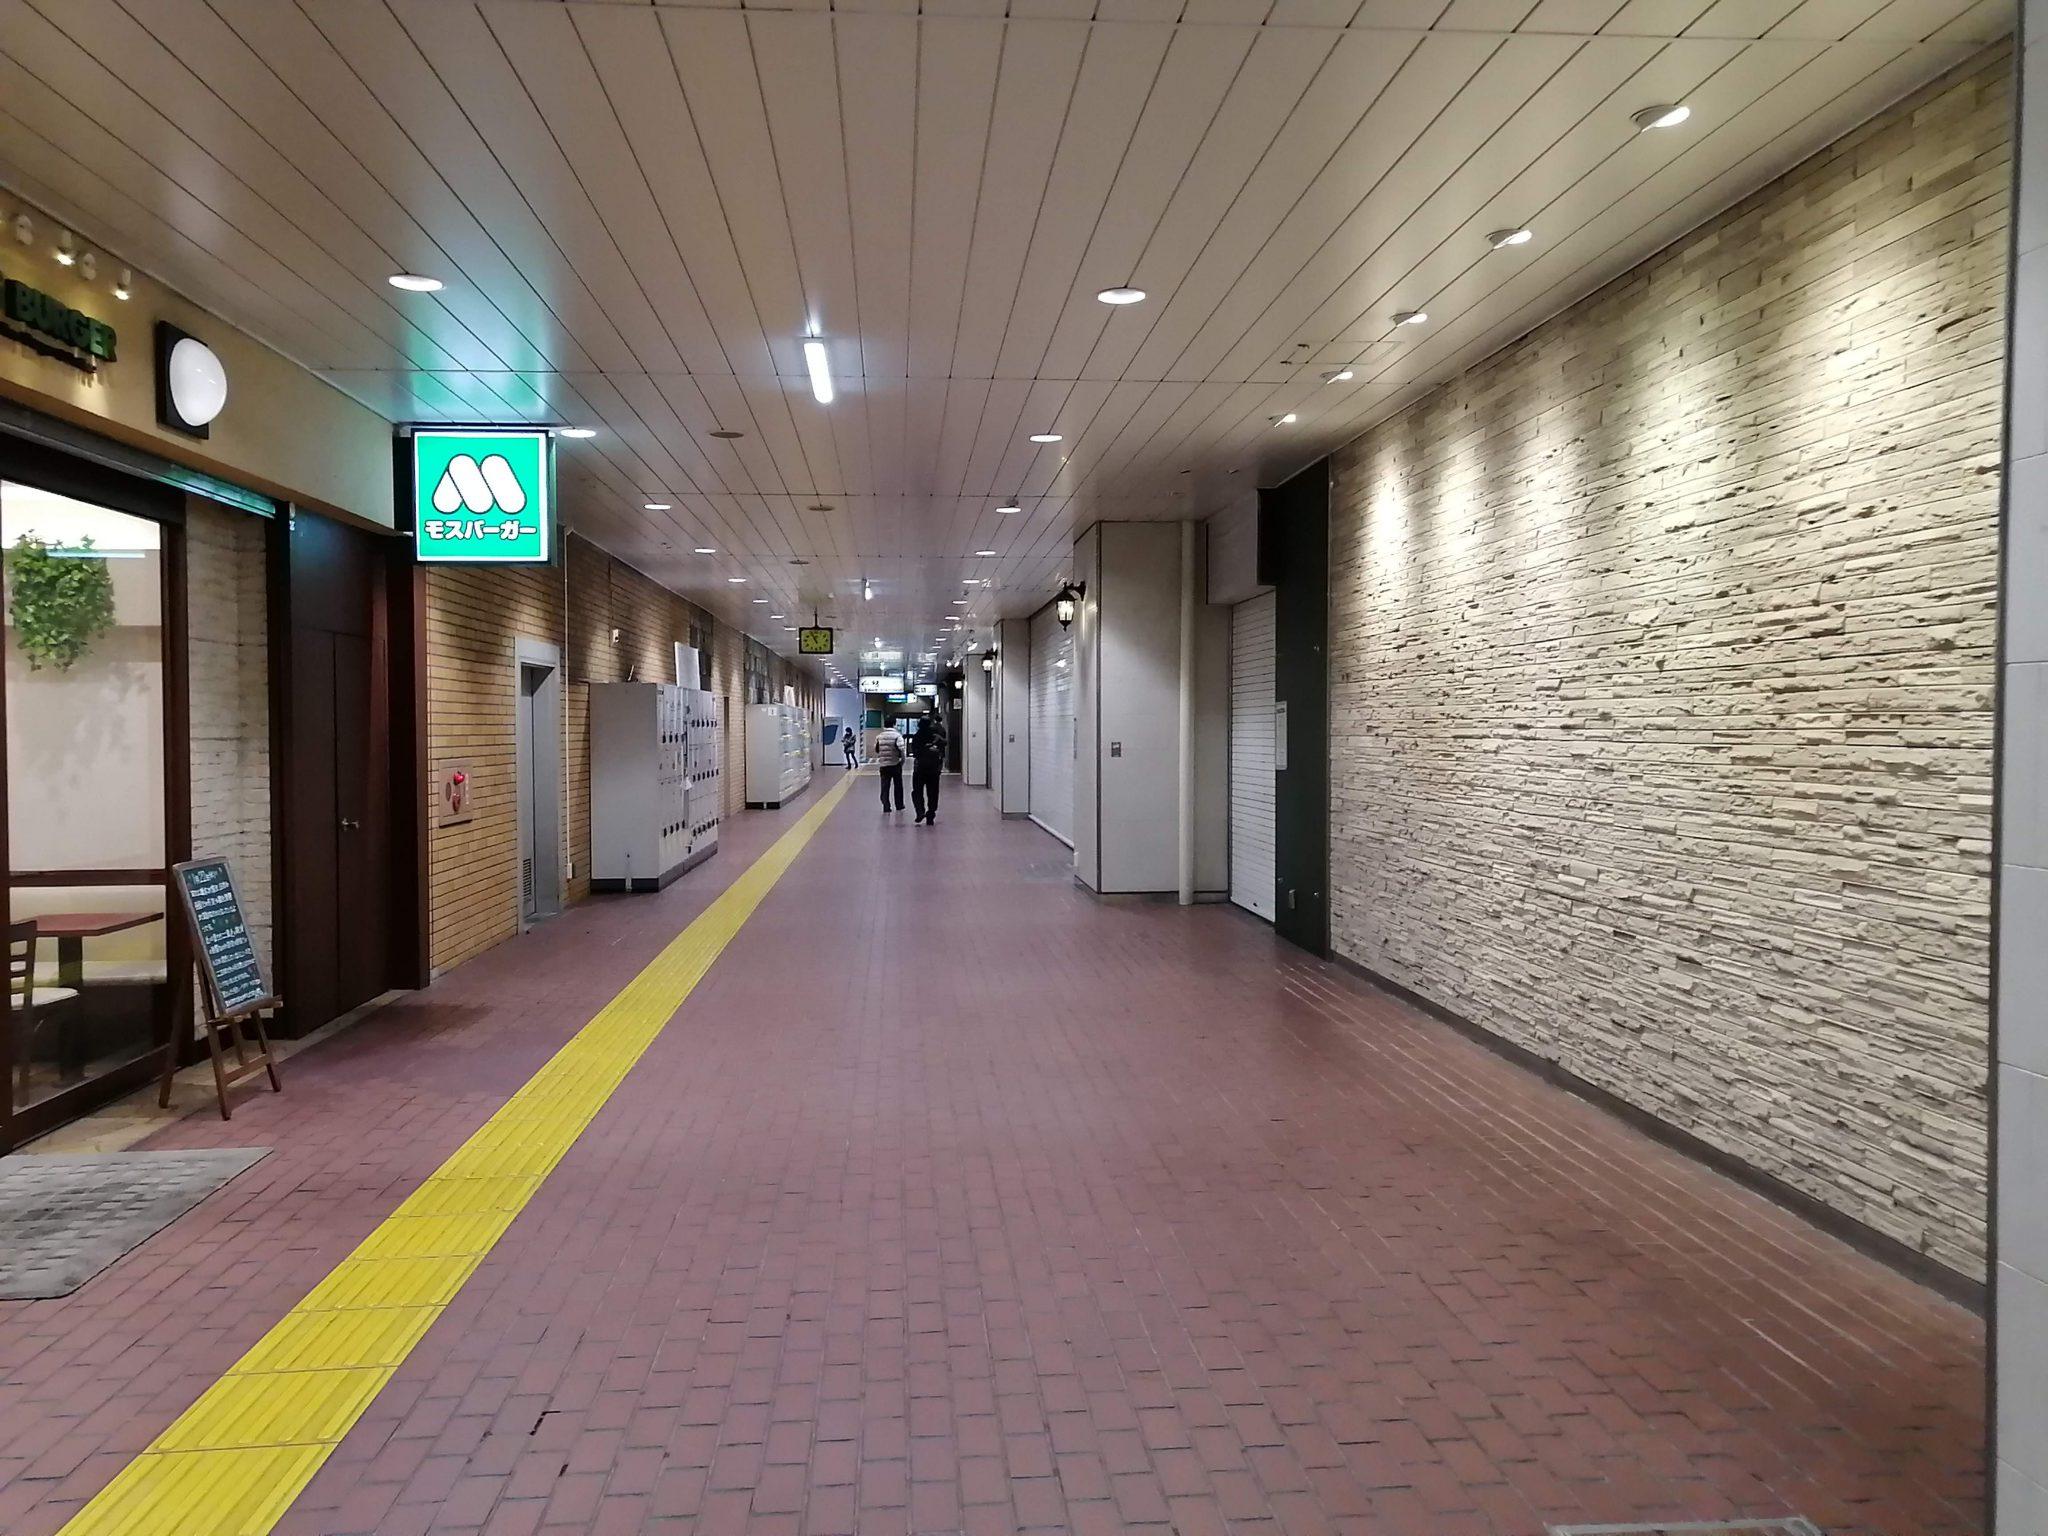 JR宇都宮駅、人気の「プロント」が閉店してた 何が起こるのか?!